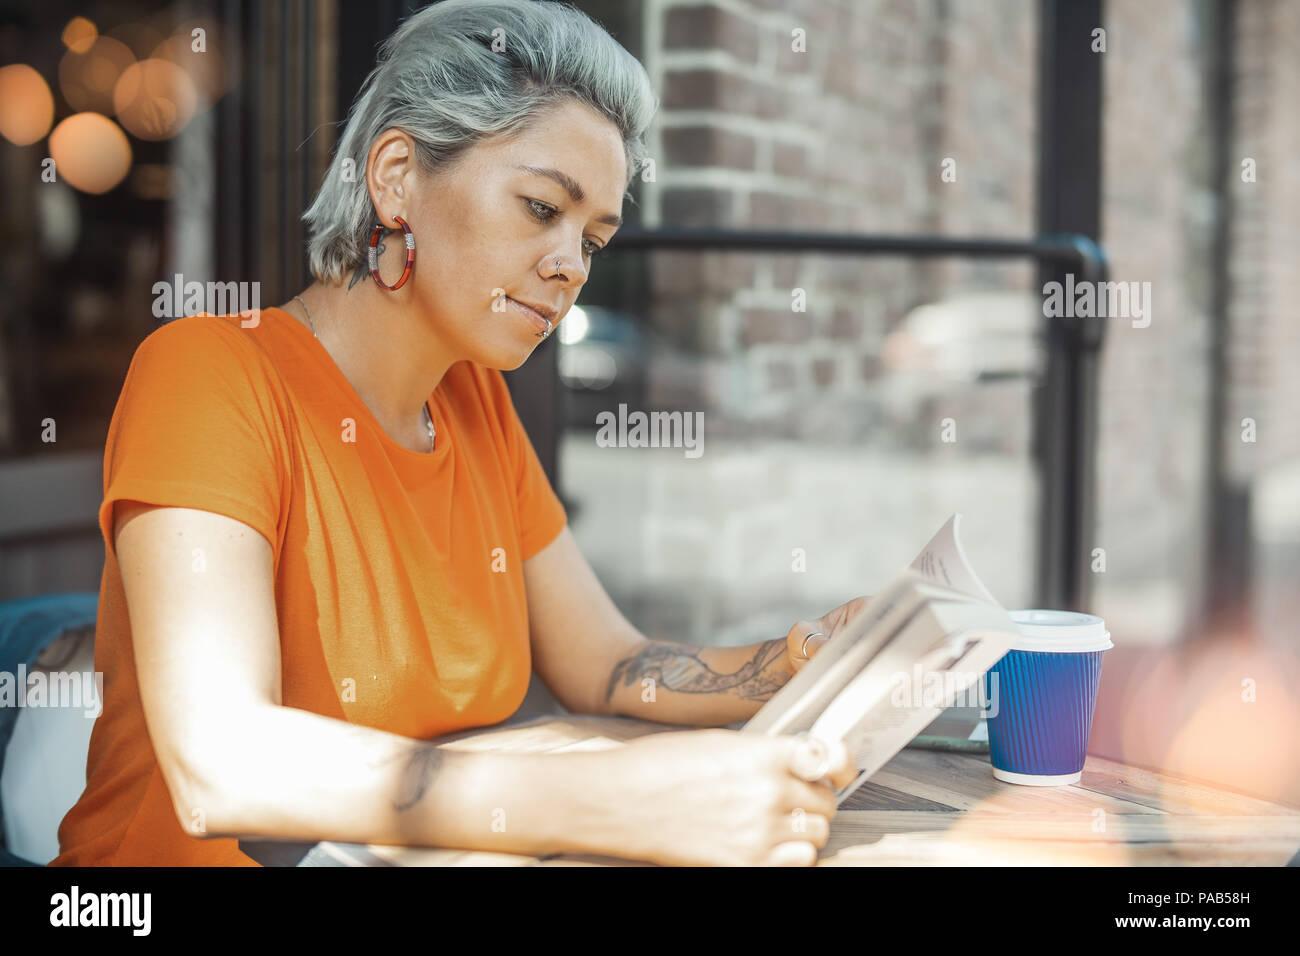 Attraktive tätowiert blonde Mädchen lesen Buch Stockbild